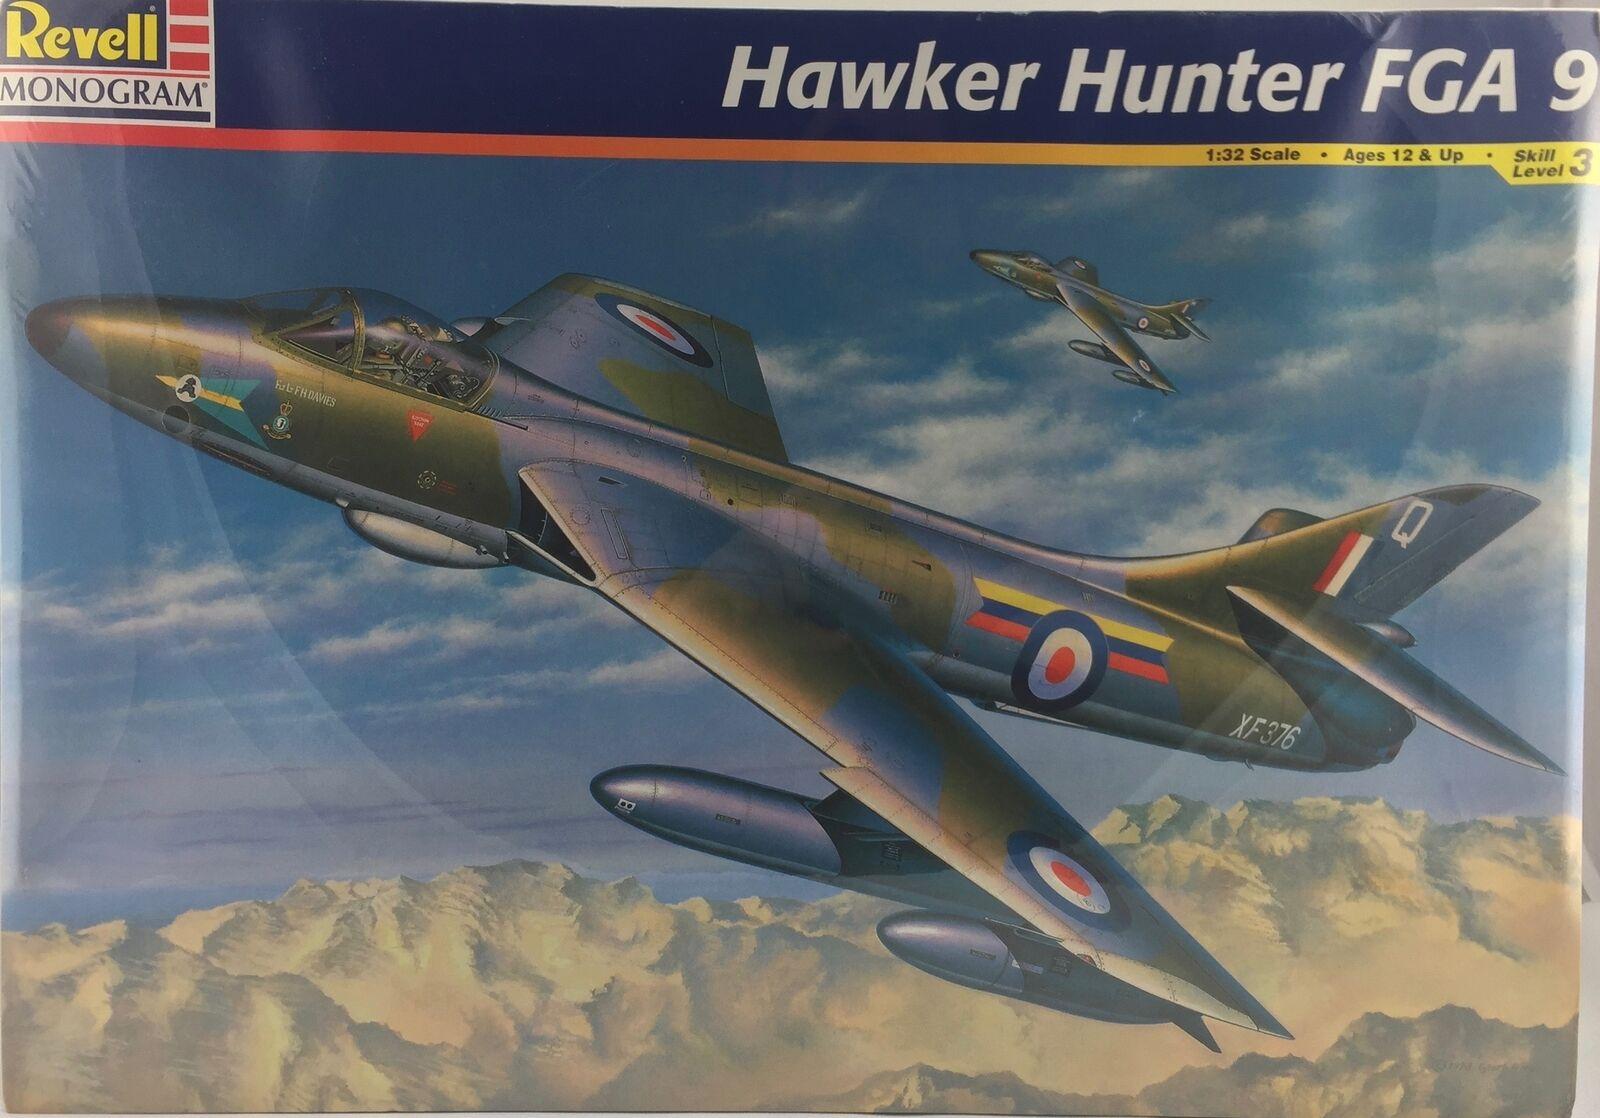 Revell Monogram Hawker Hunter FGA 9  Ref 4670 Escala 1 32